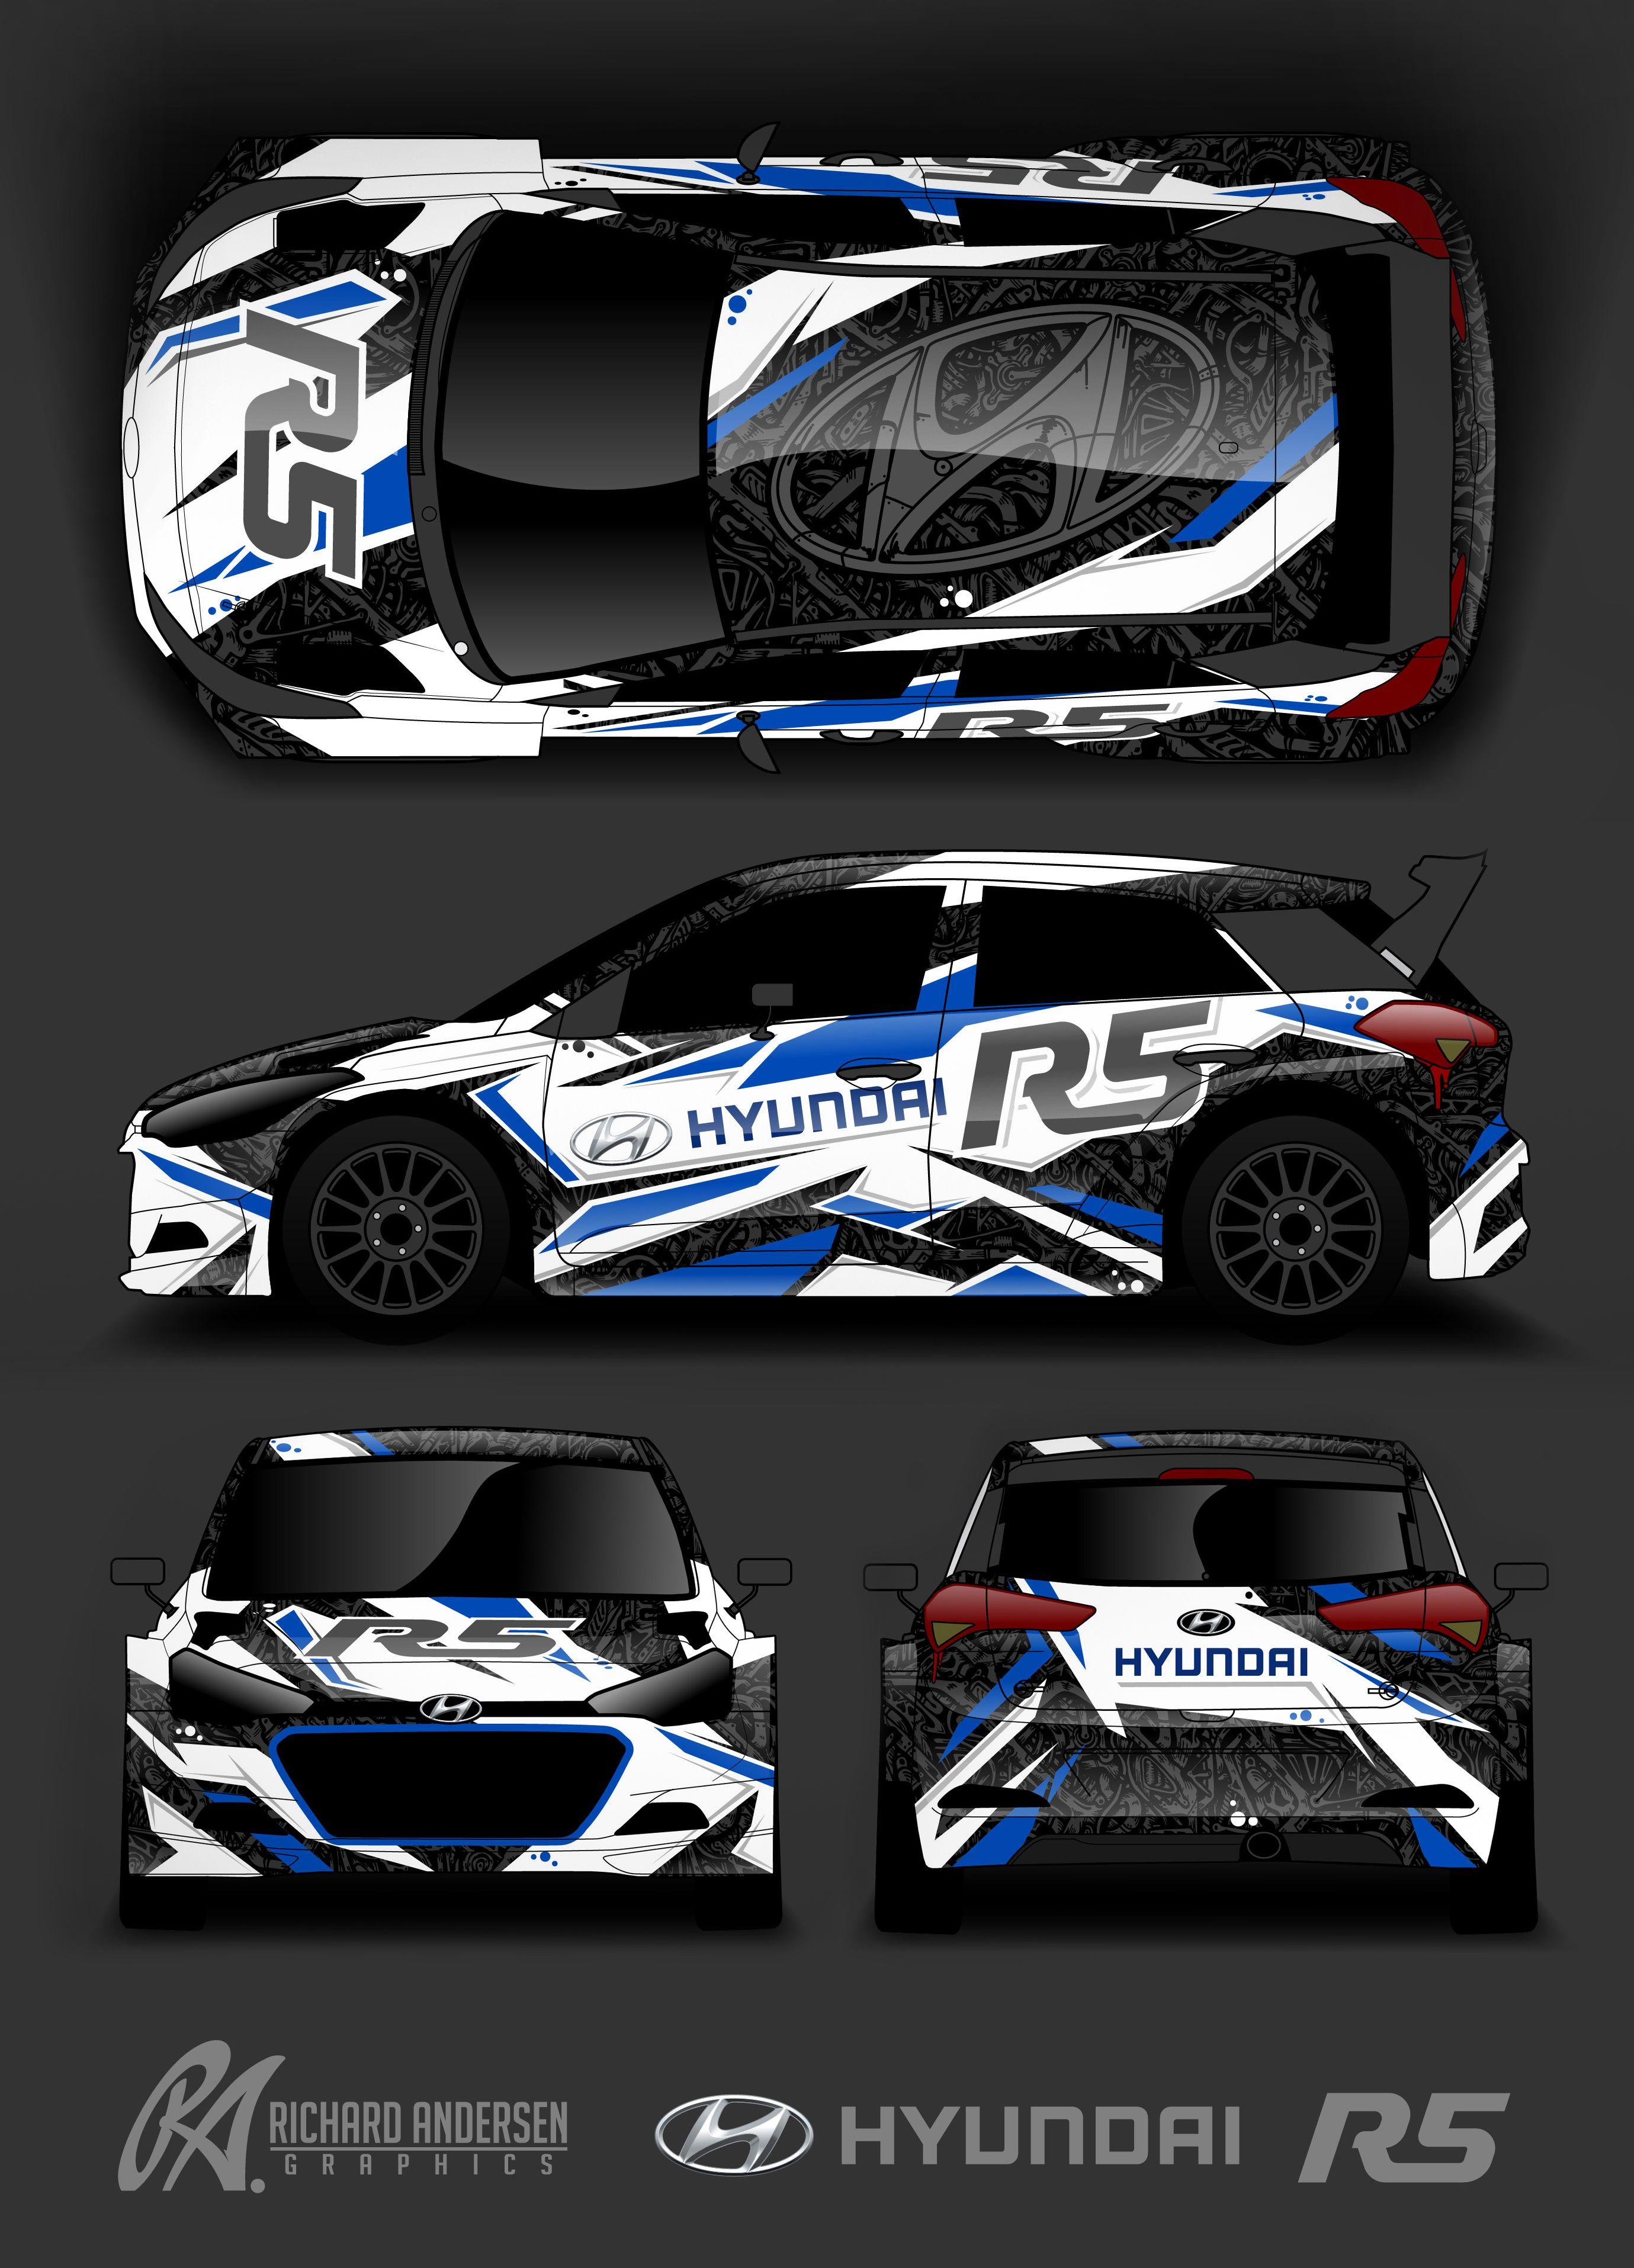 Richard Andersen Hyundai R5 Wrap Design Car Competitions Car Wrap Design Car Graphics